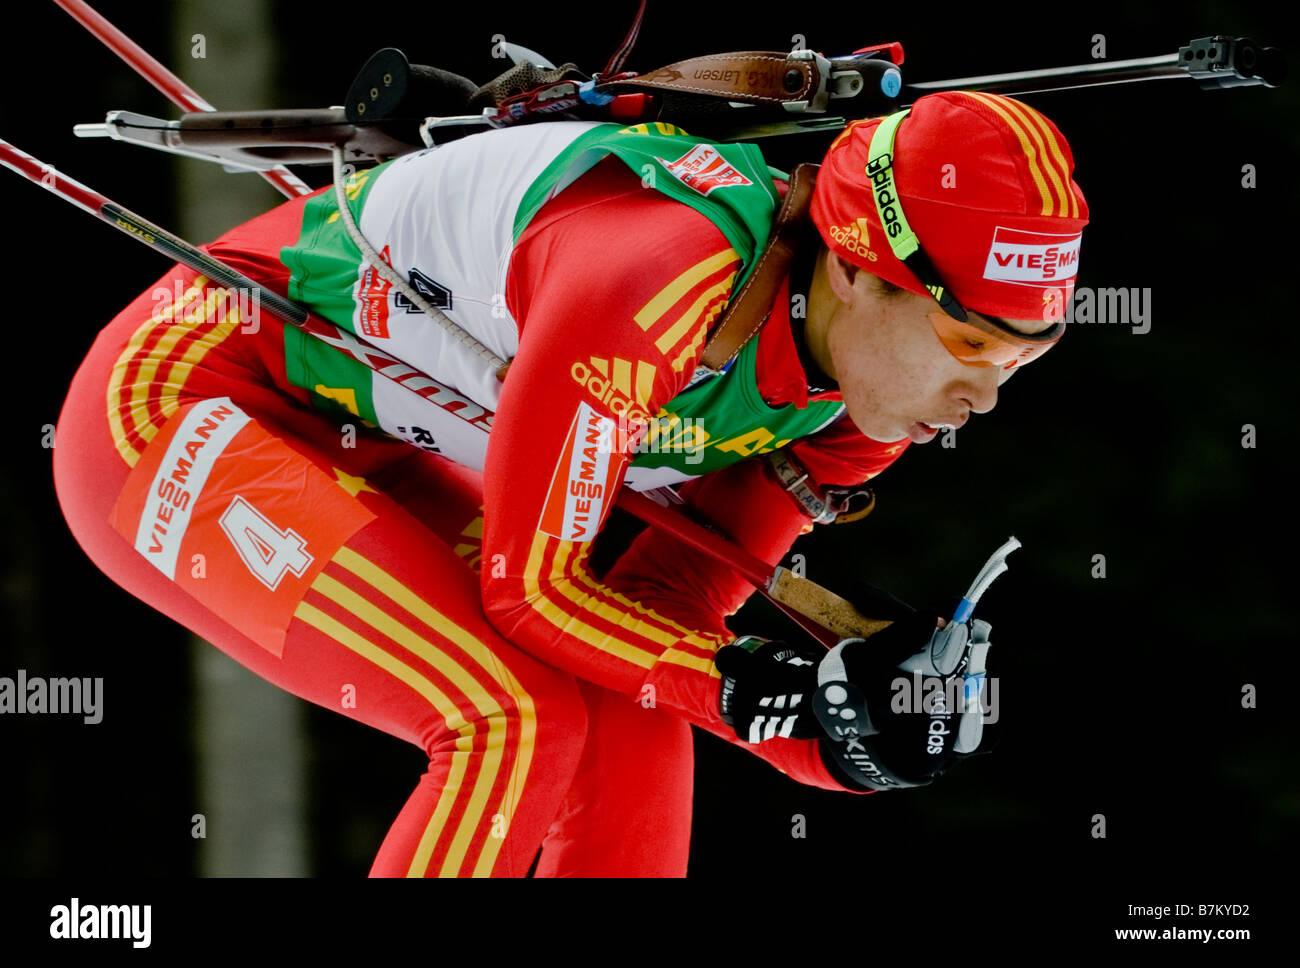 WANG Chunli China Biathlon Weltcup Verfolgung Frauen Männer Ruhpolding 18 1 2009 - Stock Image